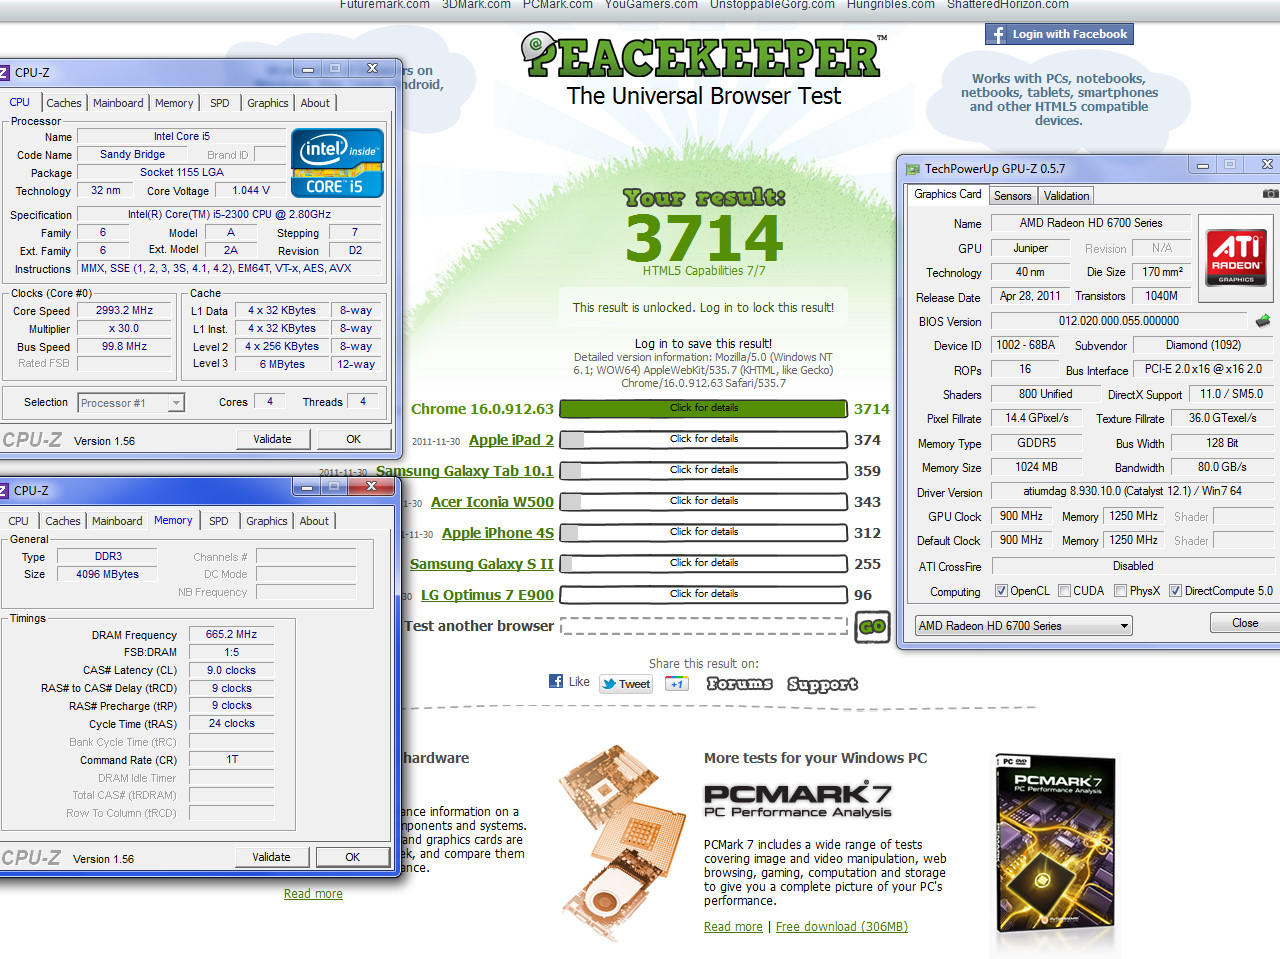 57fd07ed436cc_bandicam2012-01-0113-49-29